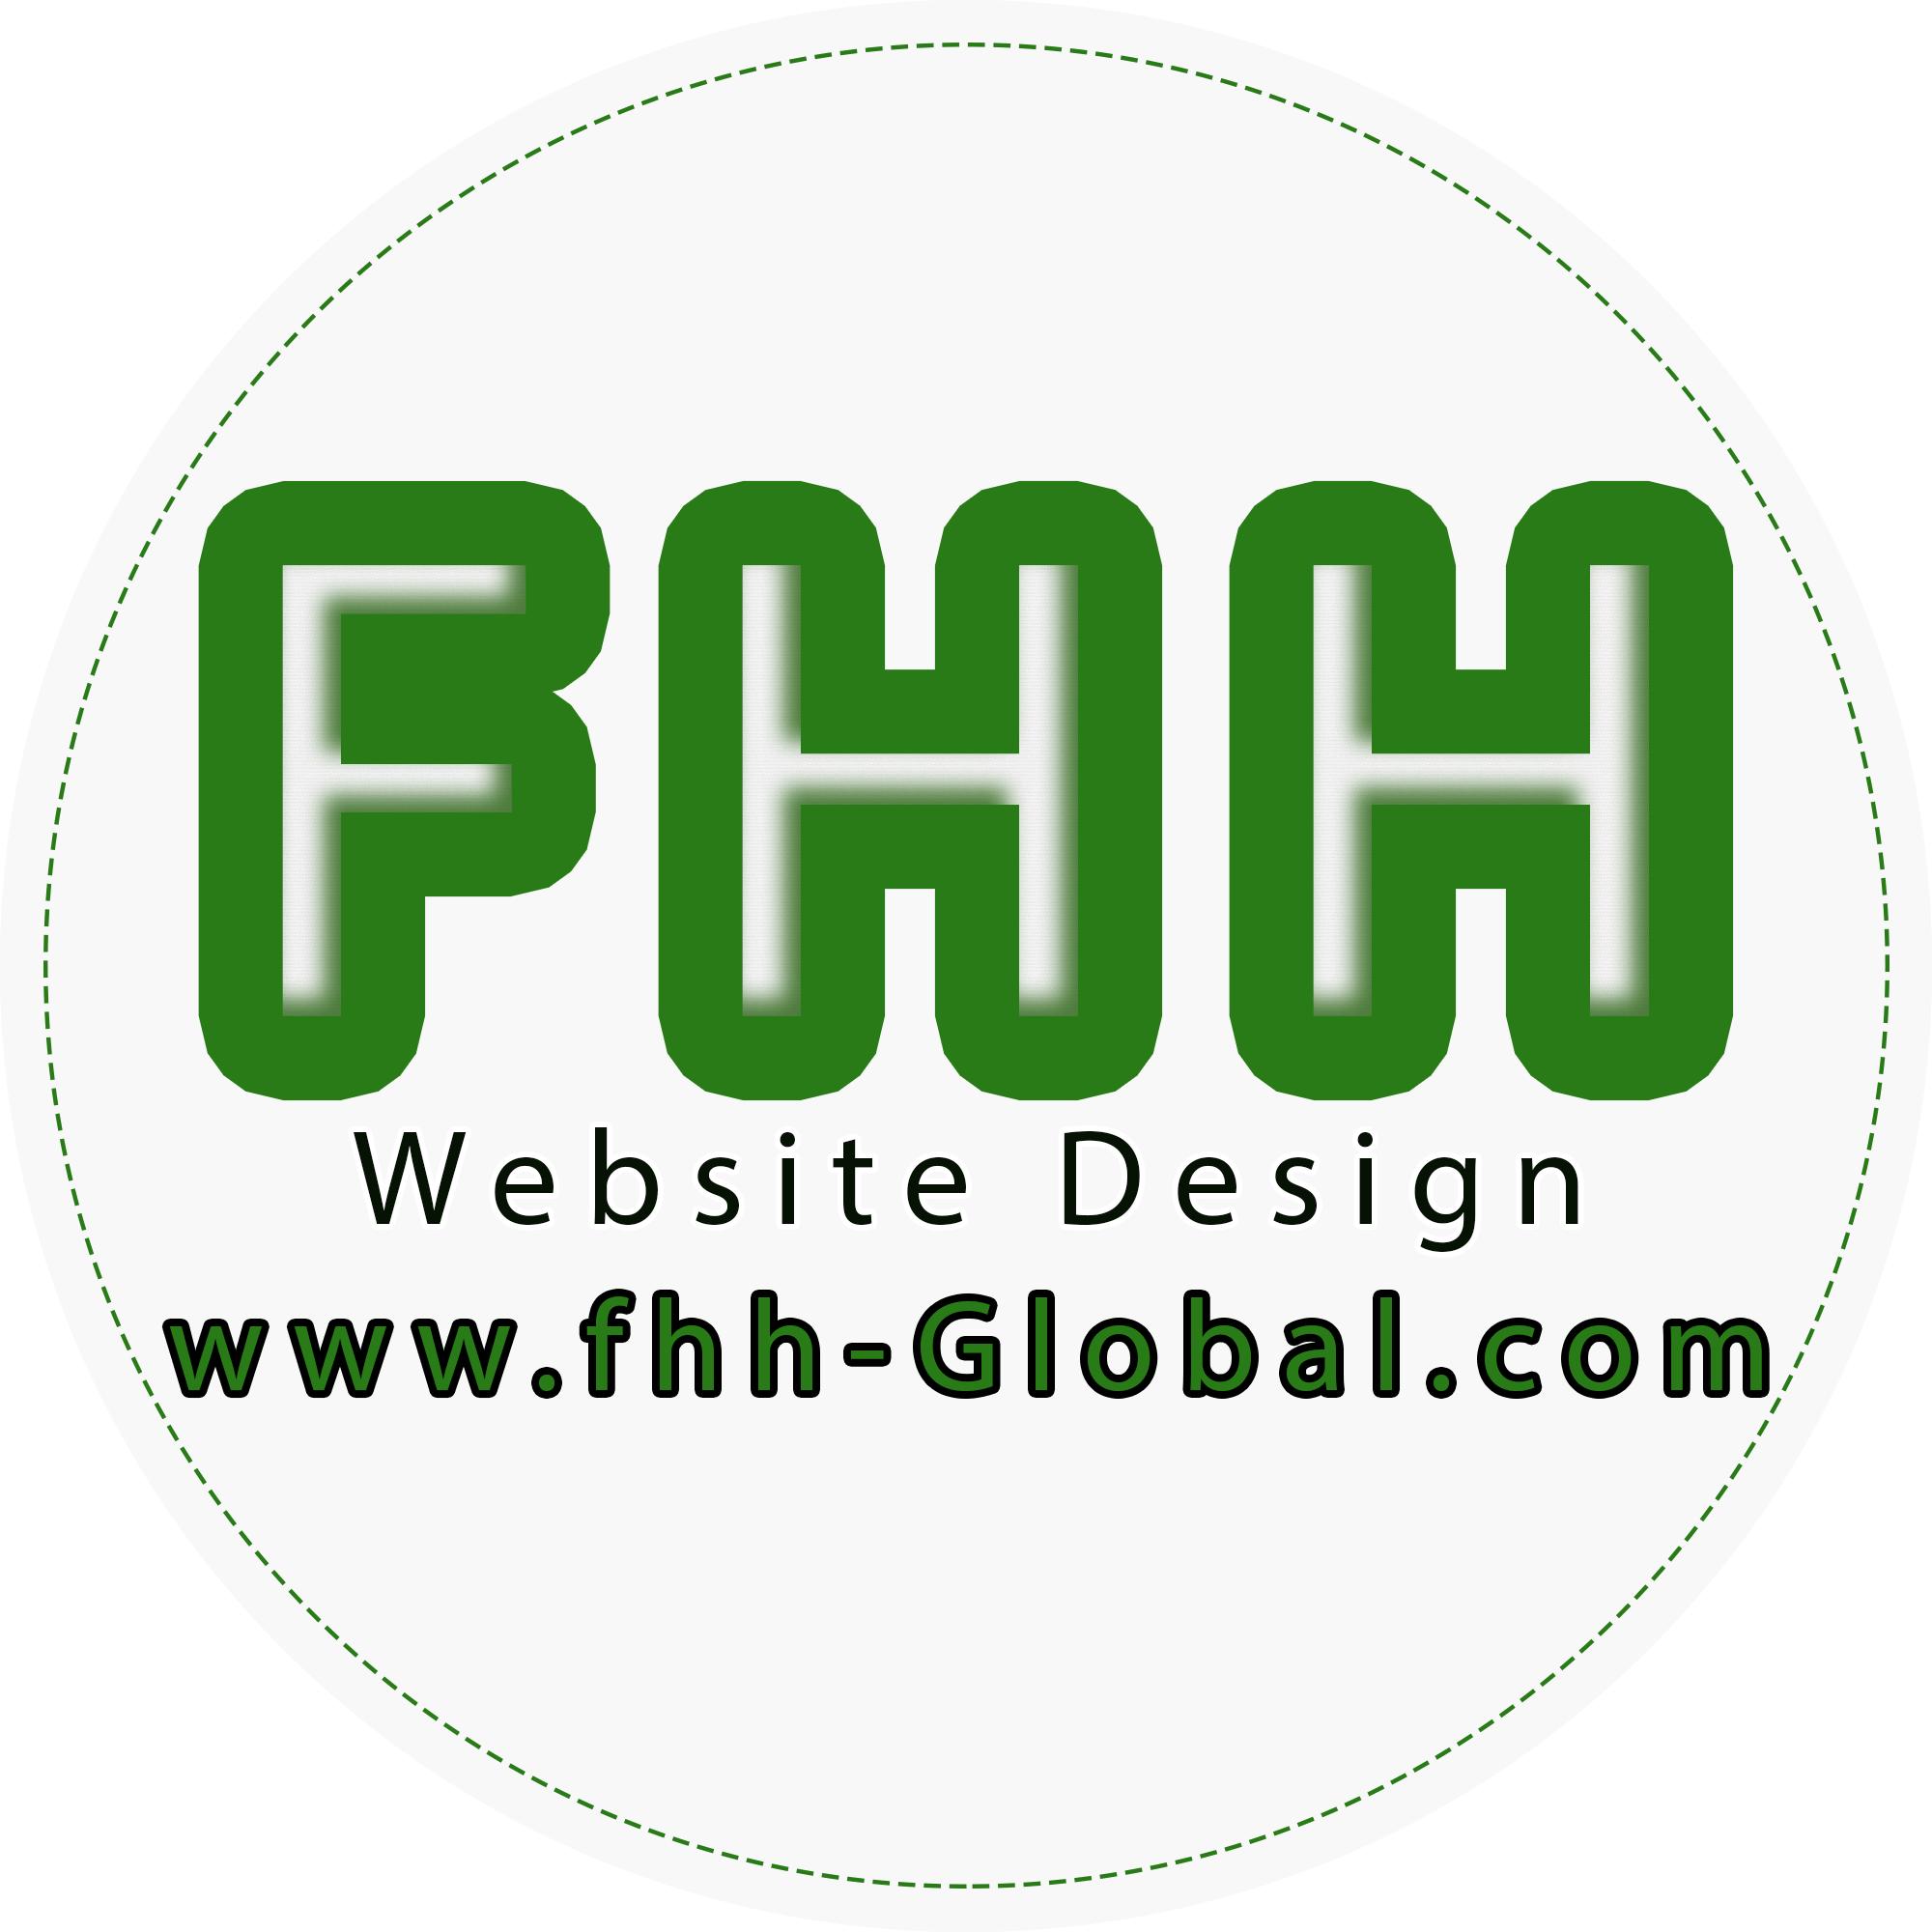 fhh-global.com